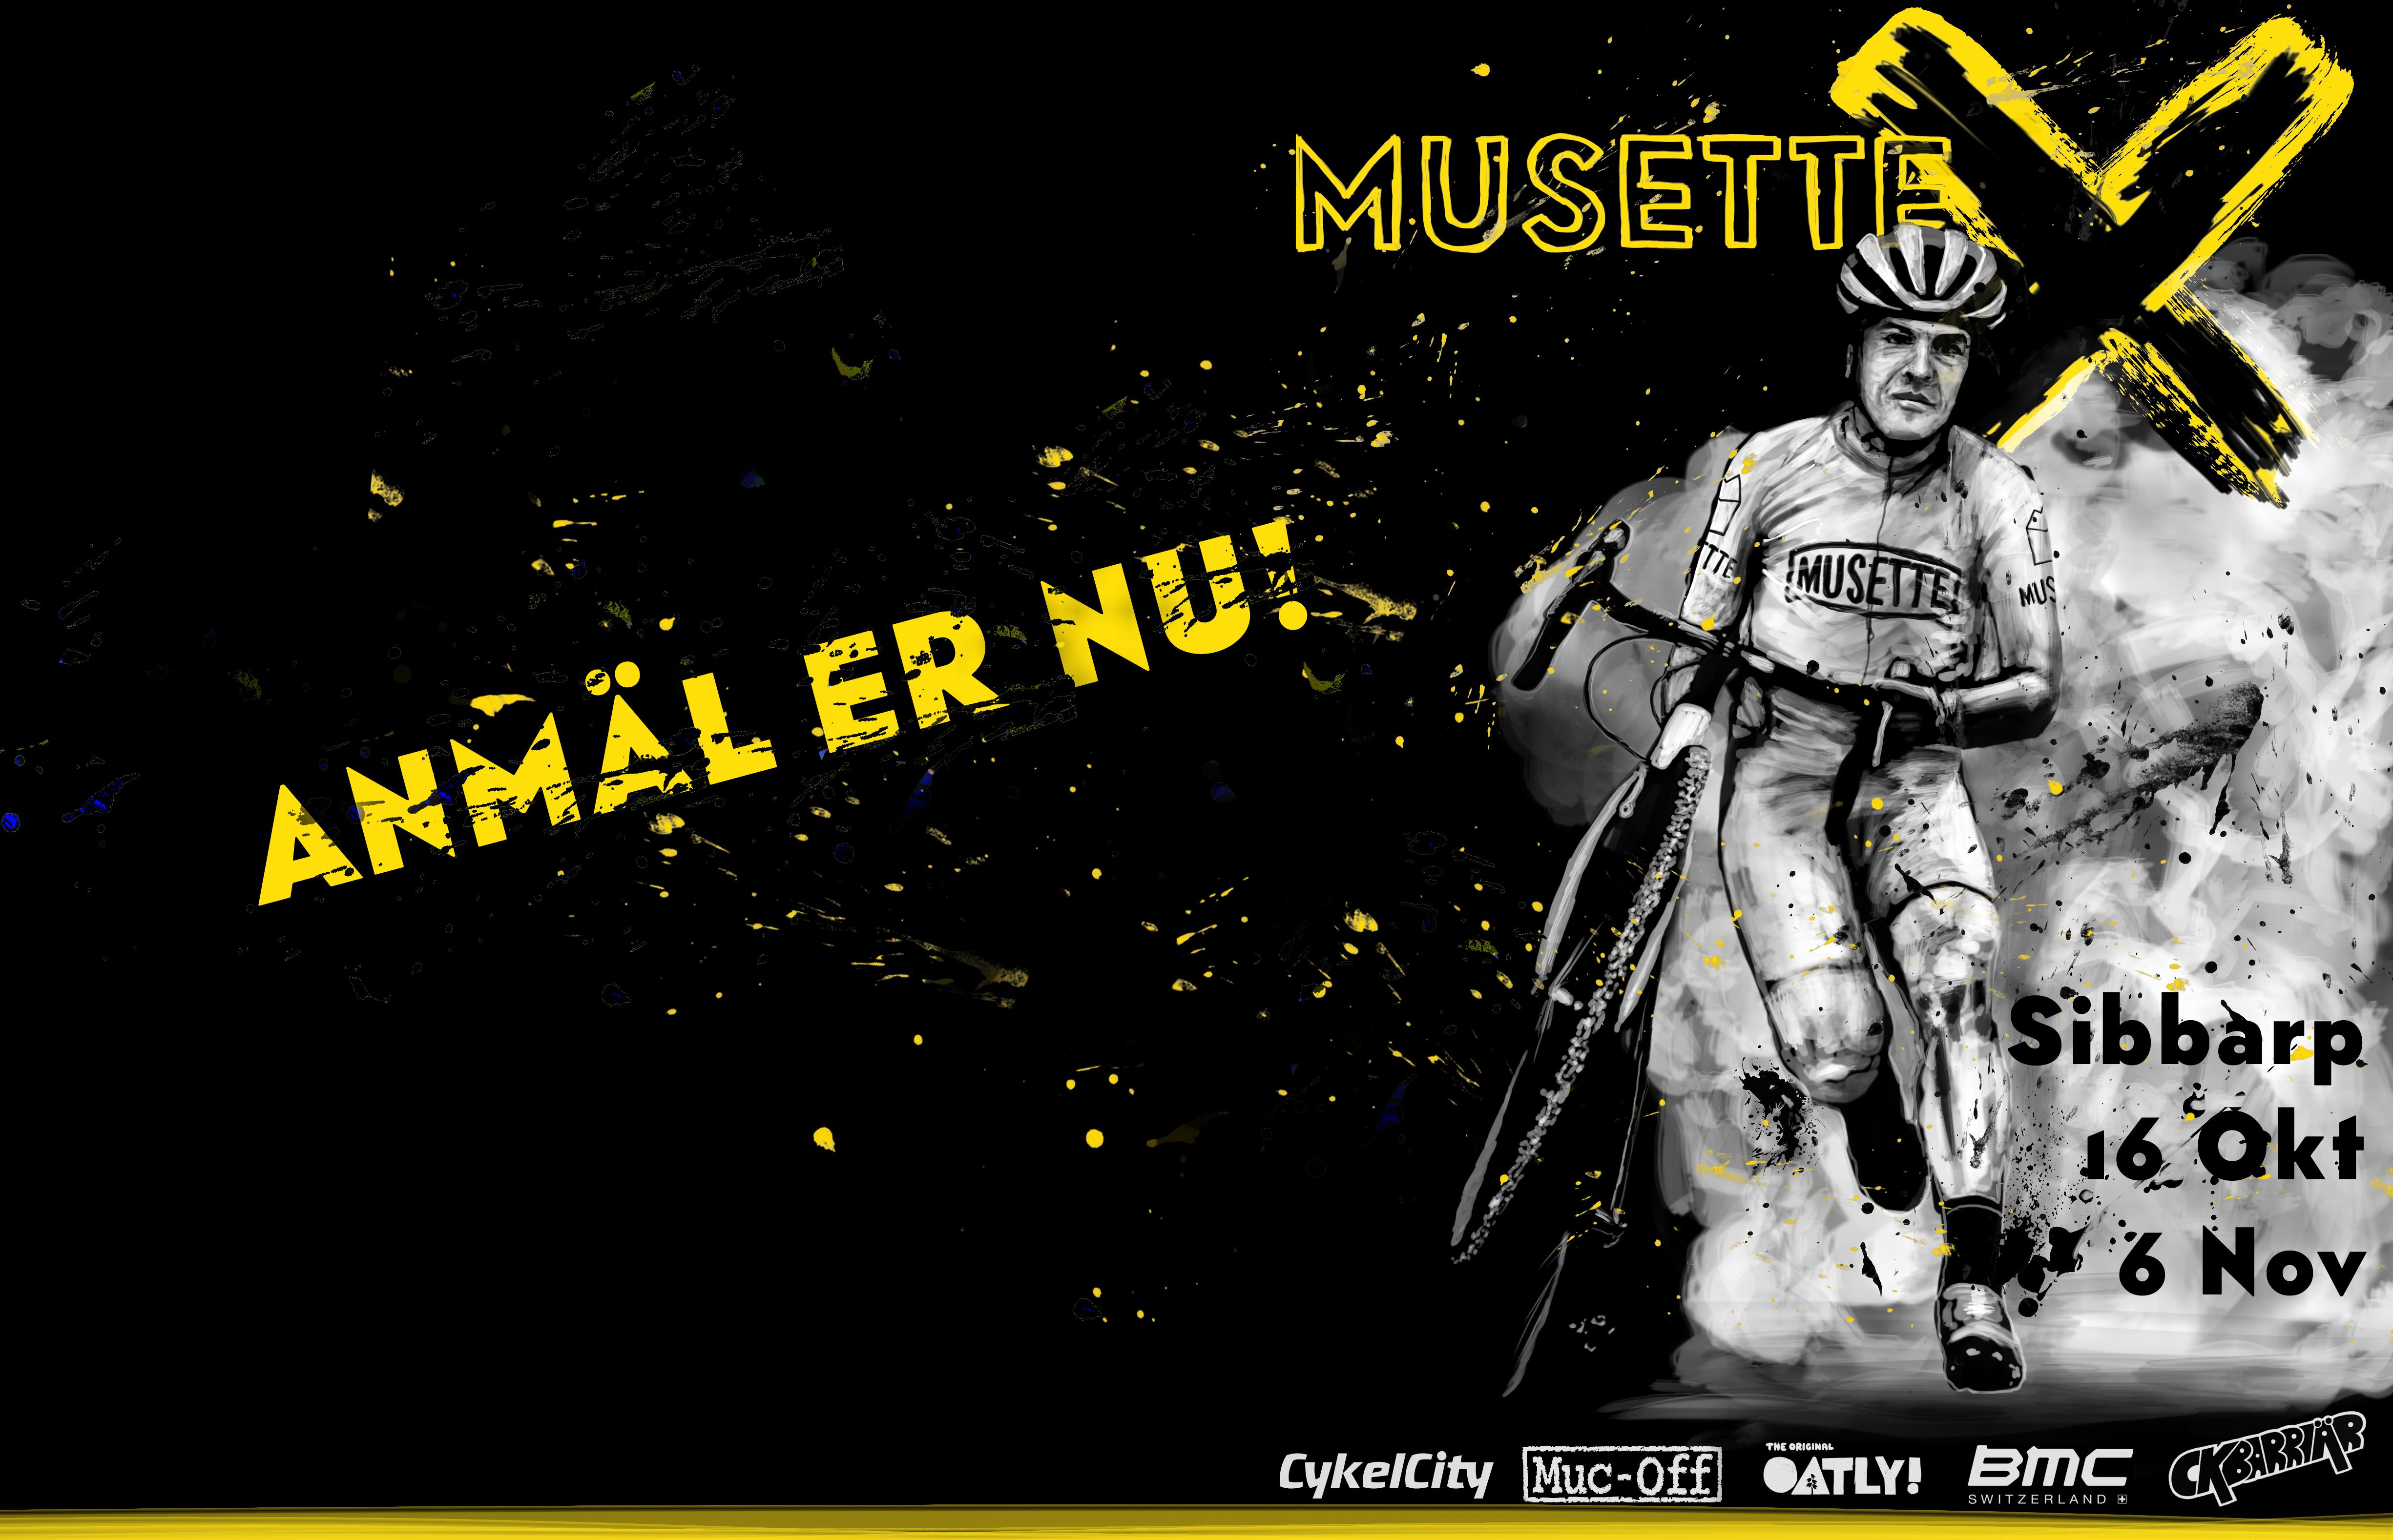 musettecross-poster-web-copy